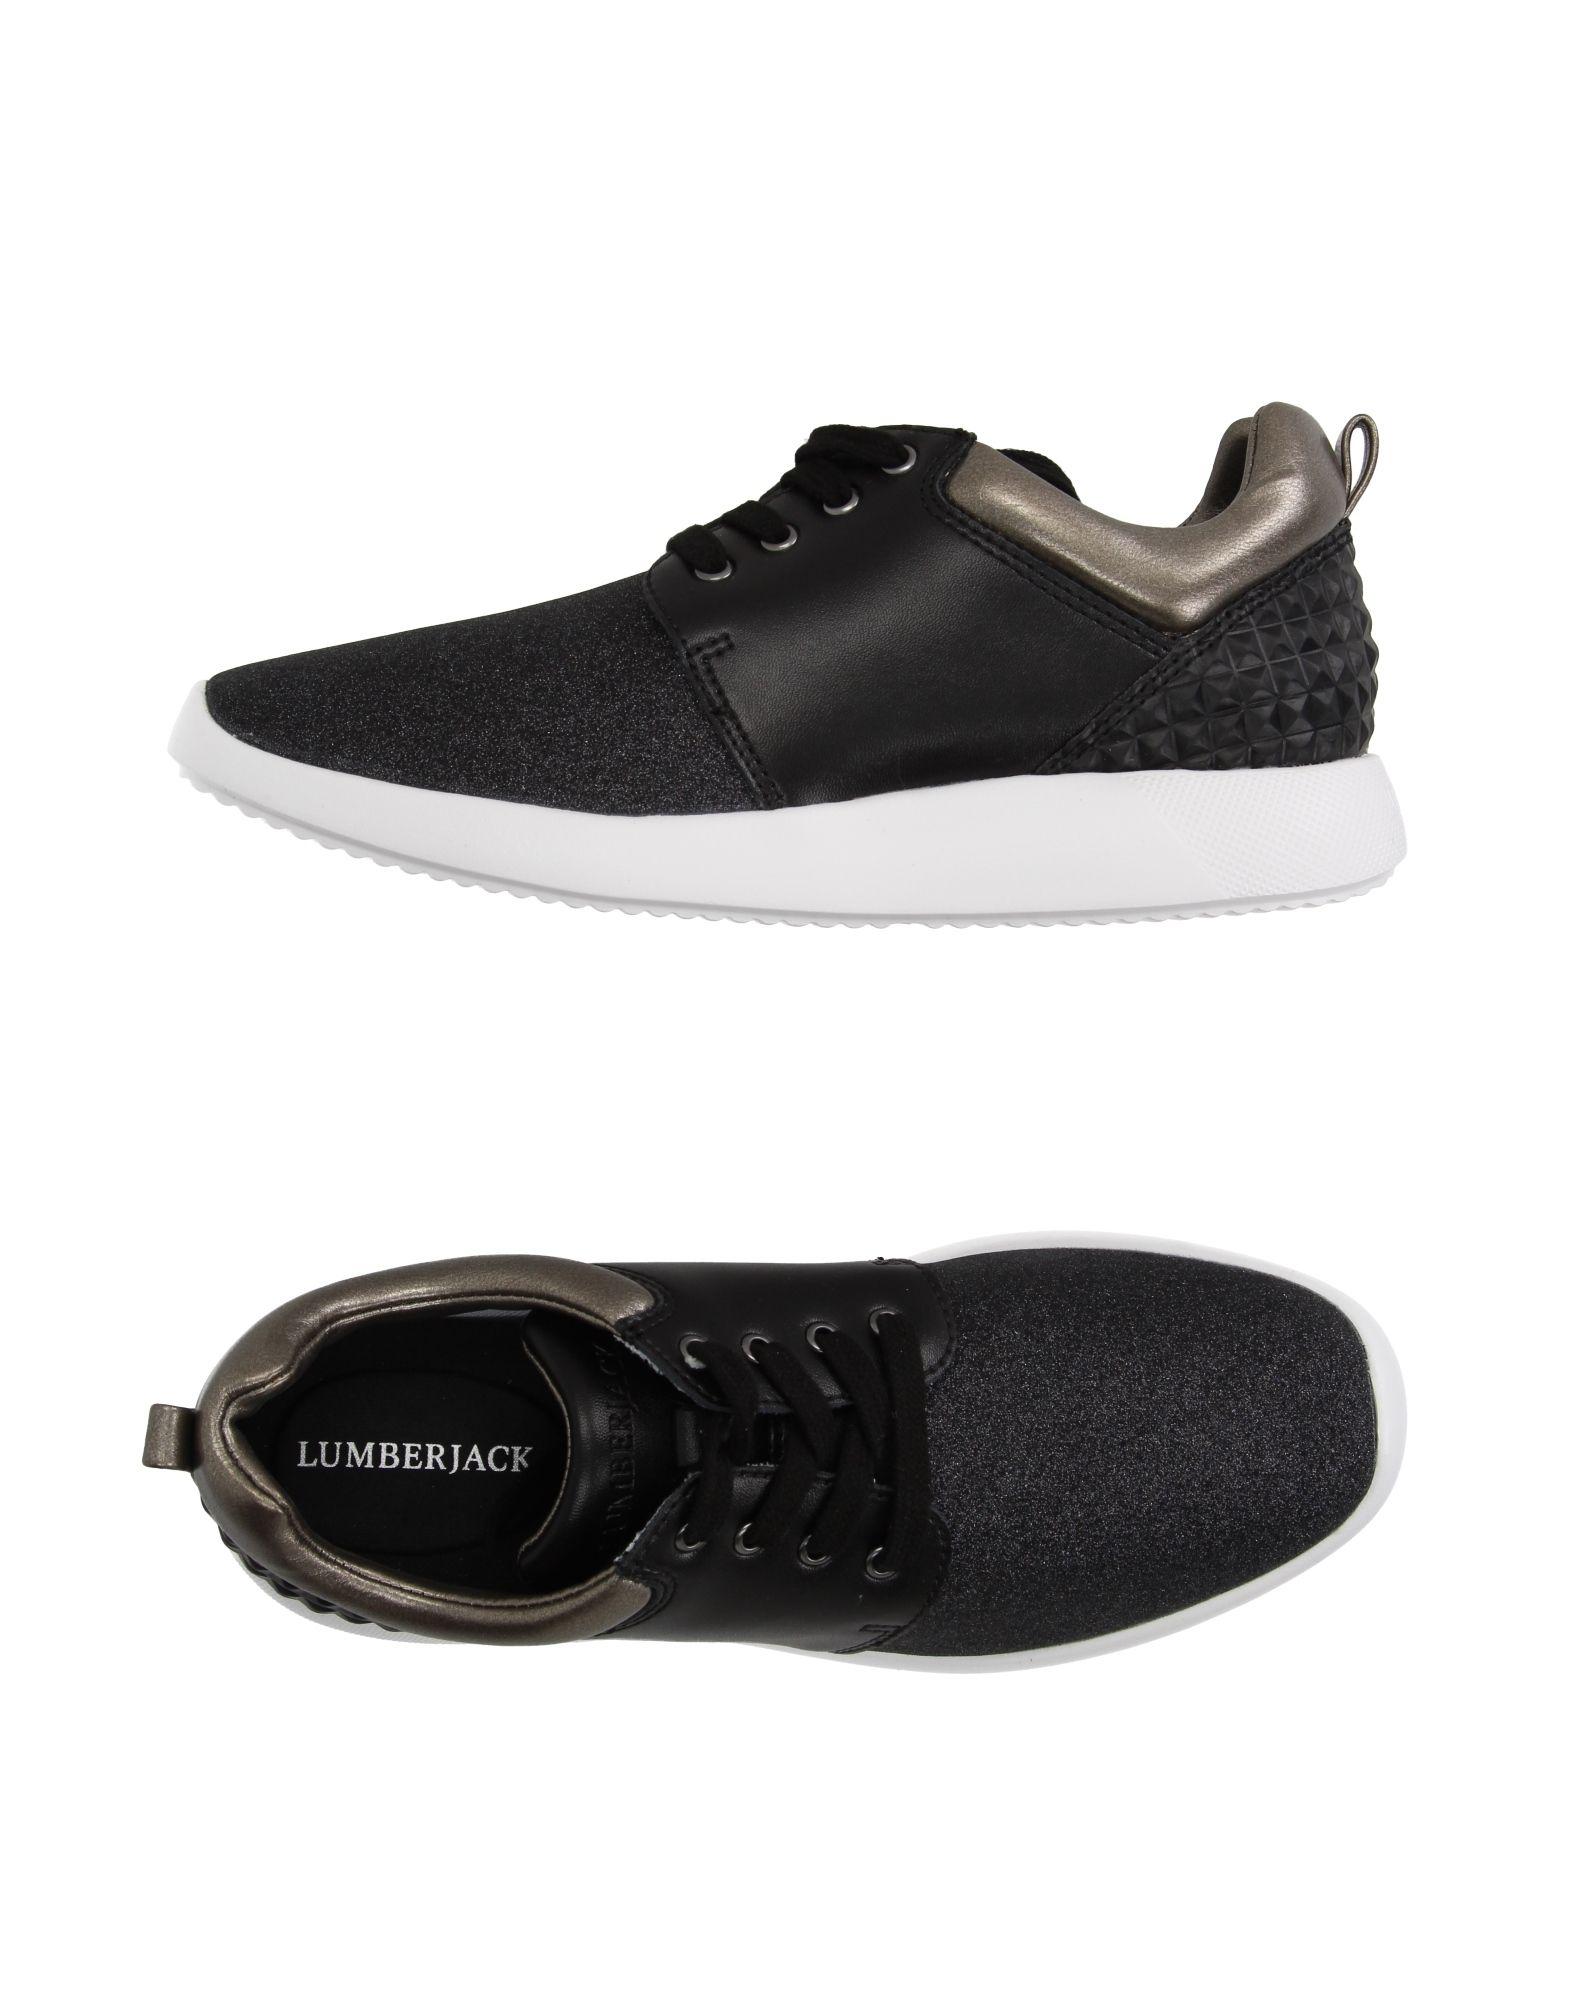 LUMBERJACK Damen Low Sneakers & Tennisschuhe Farbe Schwarz Größe 9 jetztbilligerkaufen